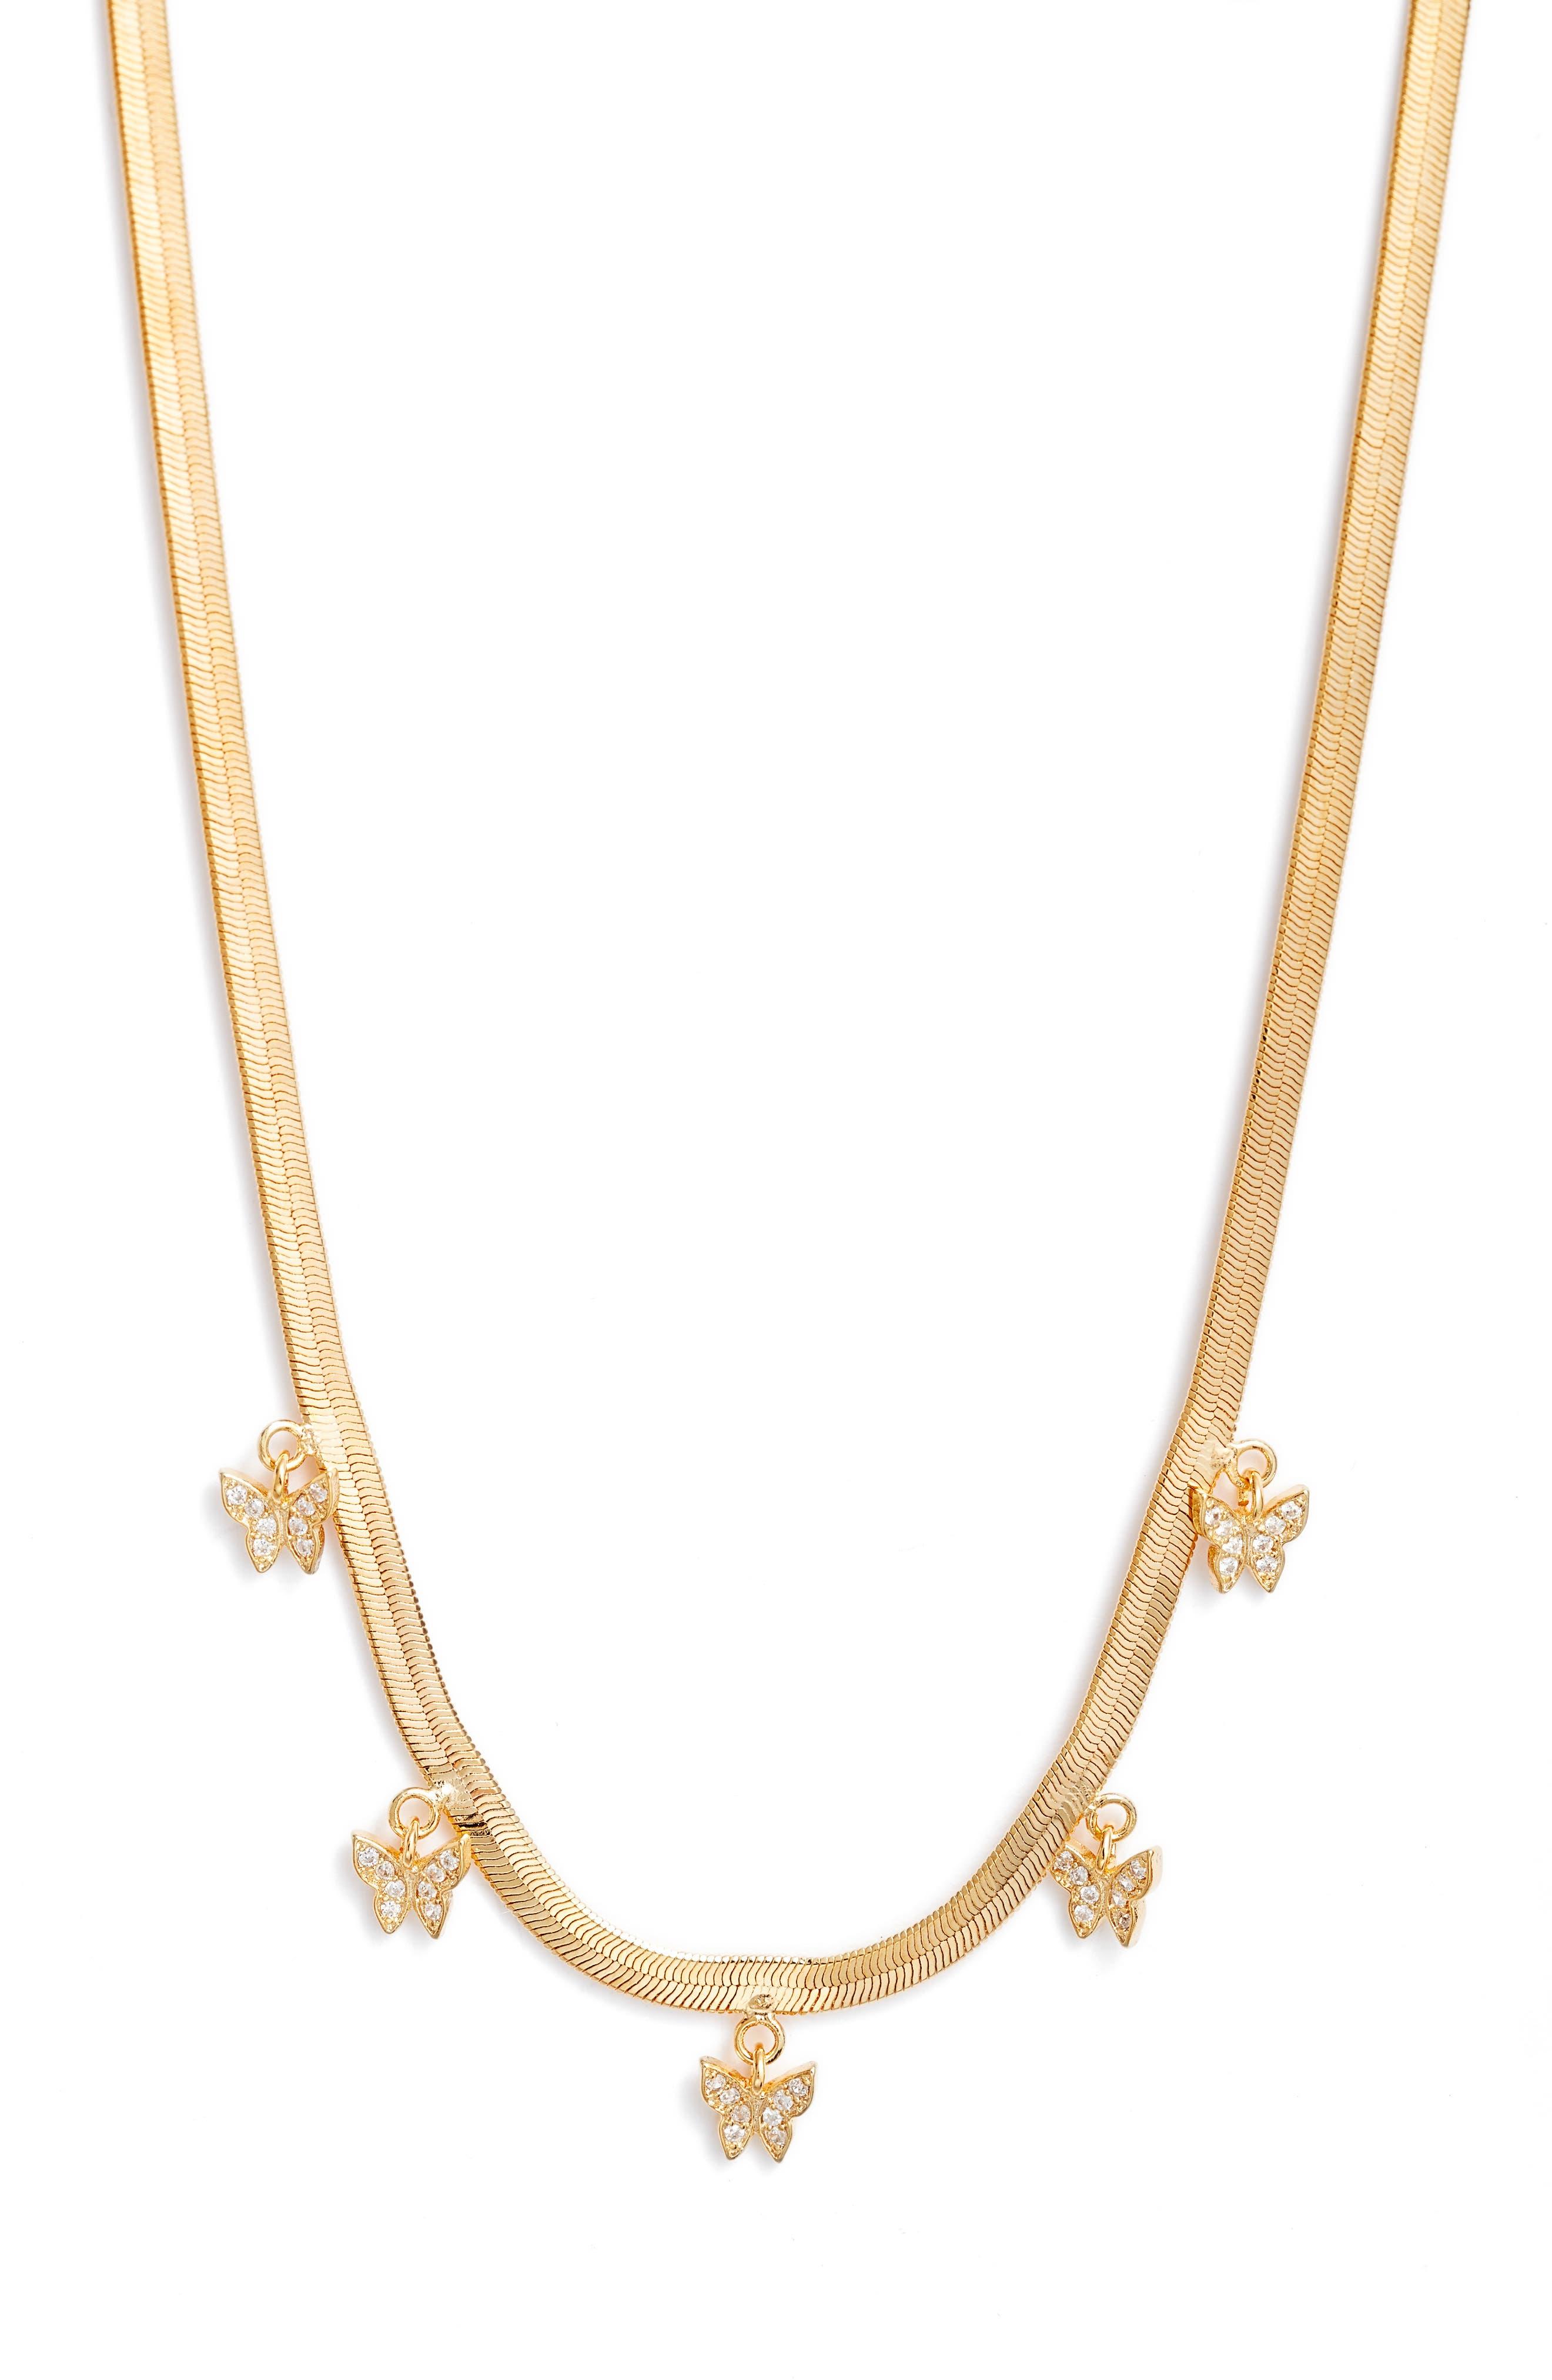 Bracha Free Spirit Cubic Zirconia Herringbone Necklace in Gold at Nordstrom